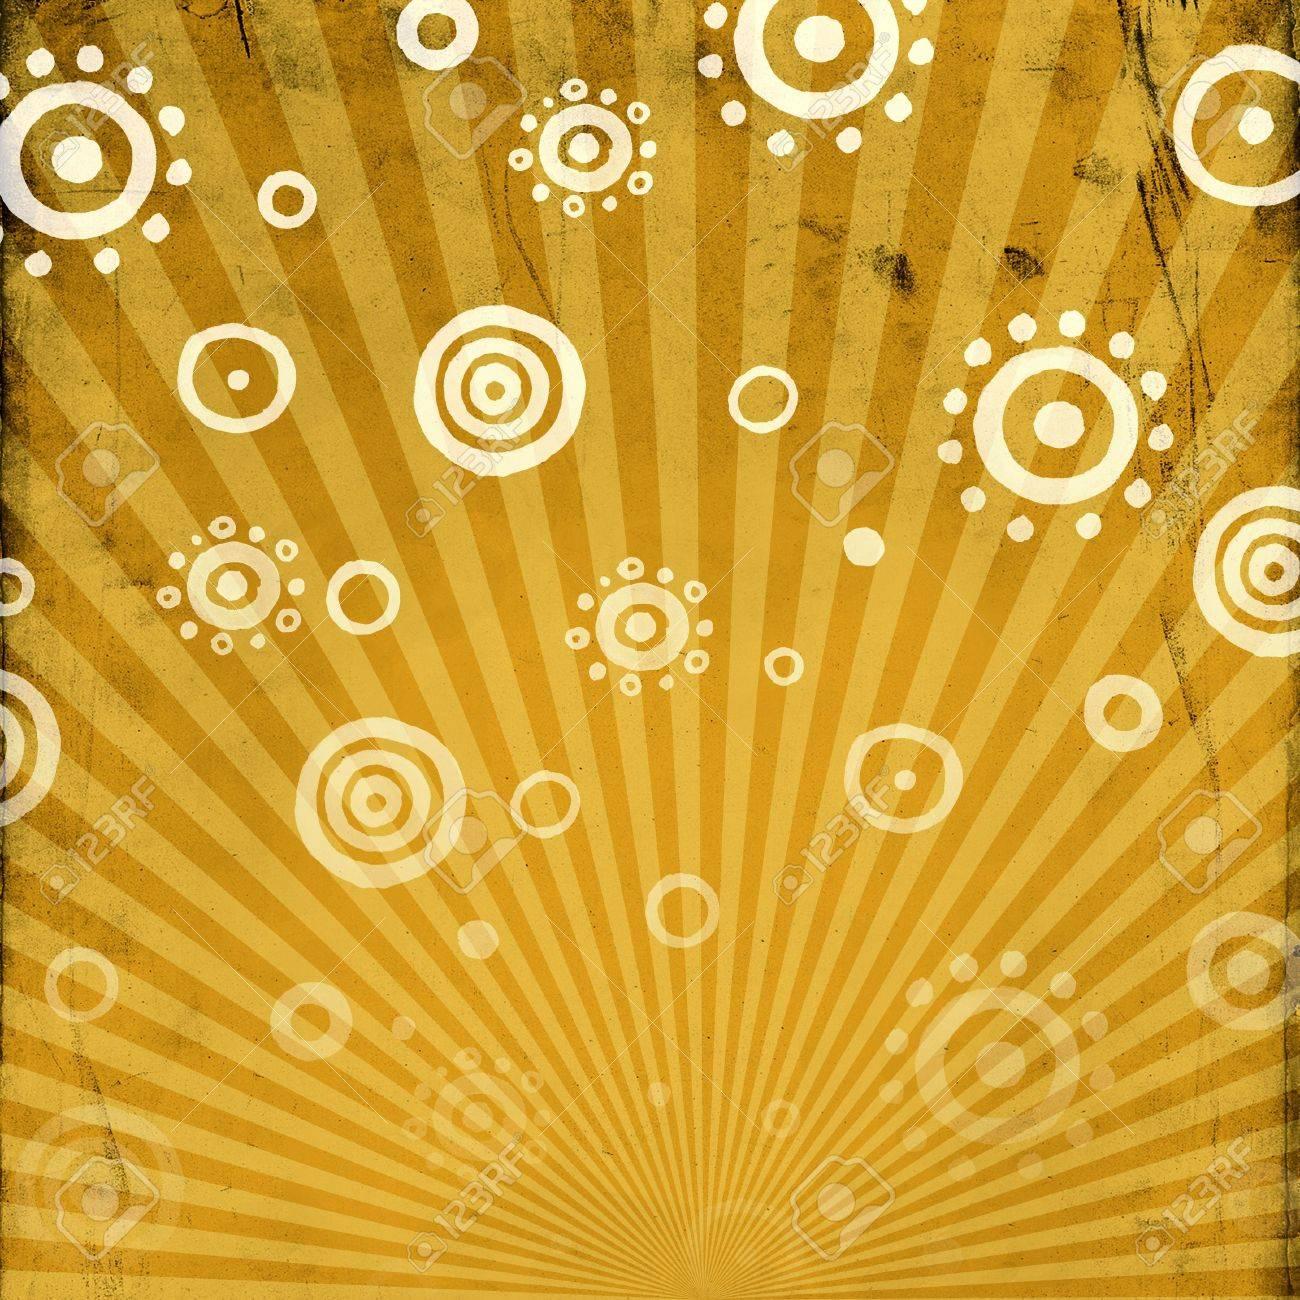 Rolled sun pattern on sunburst background Stock Photo - 6130874